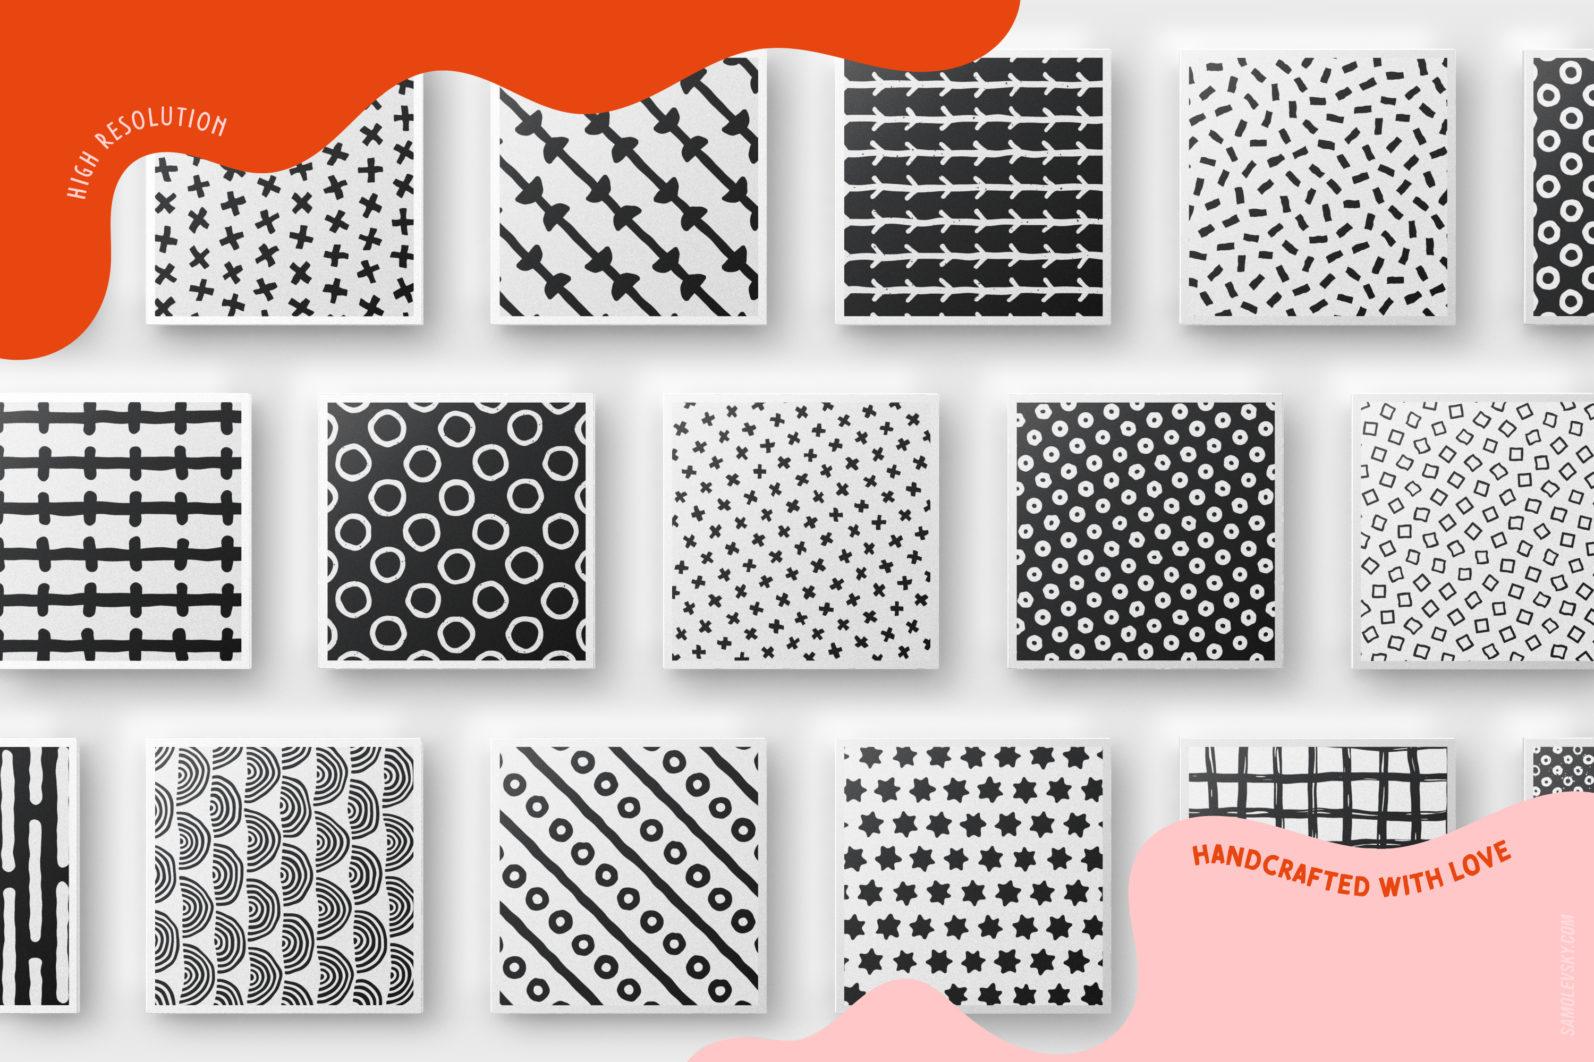 Handmade patterns bundle - 300 seamless patterns, brushes, and shapes - Samolevsky.com Handmade patterns bundle 08 scaled -